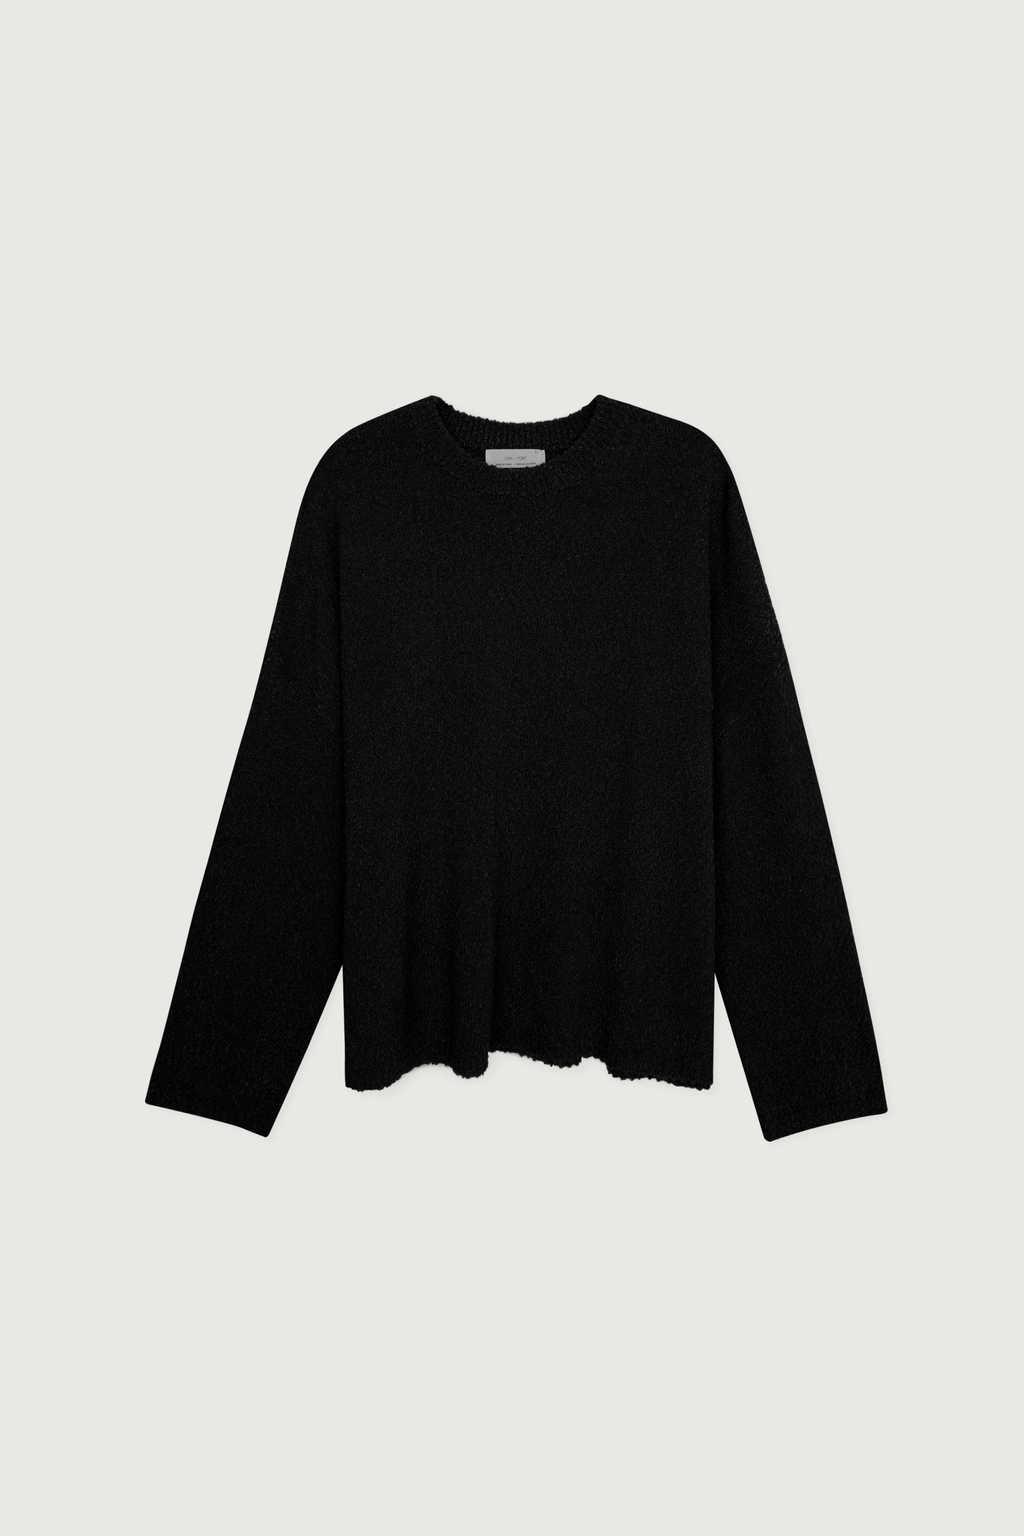 Sweater 3212 Black 5